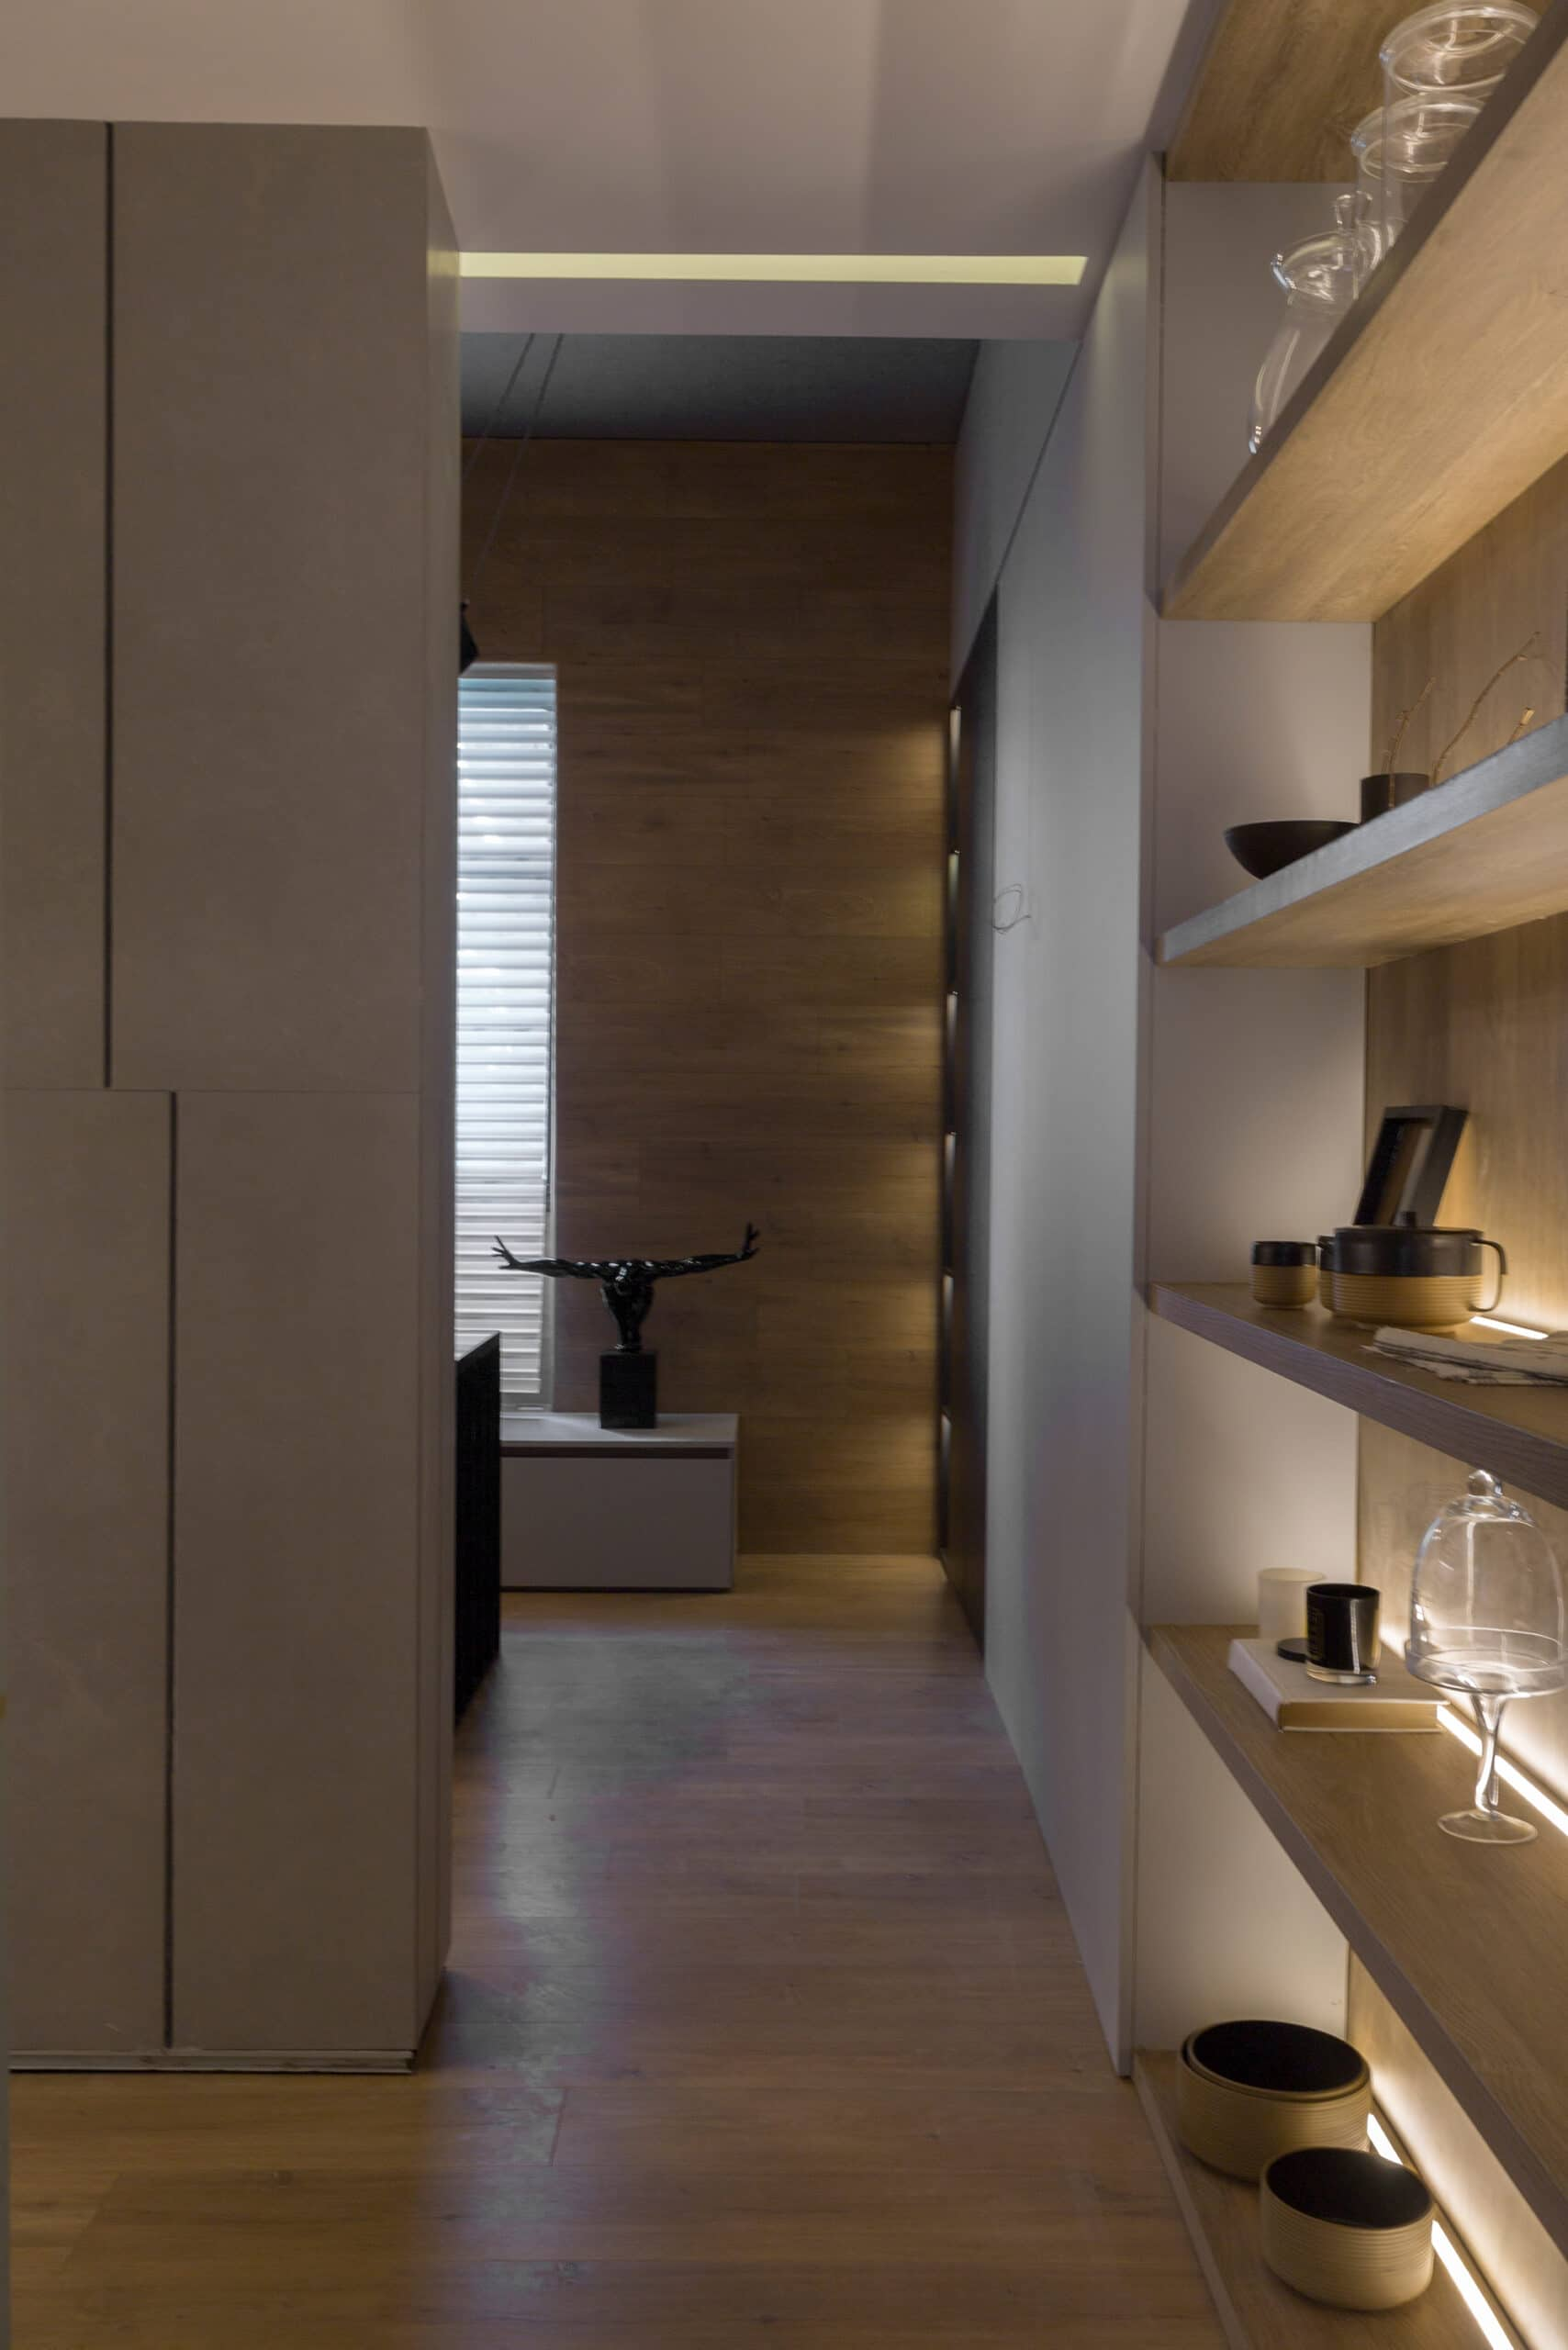 Romina Calzi Arquitectura interiorismo Casa foa 3@2x